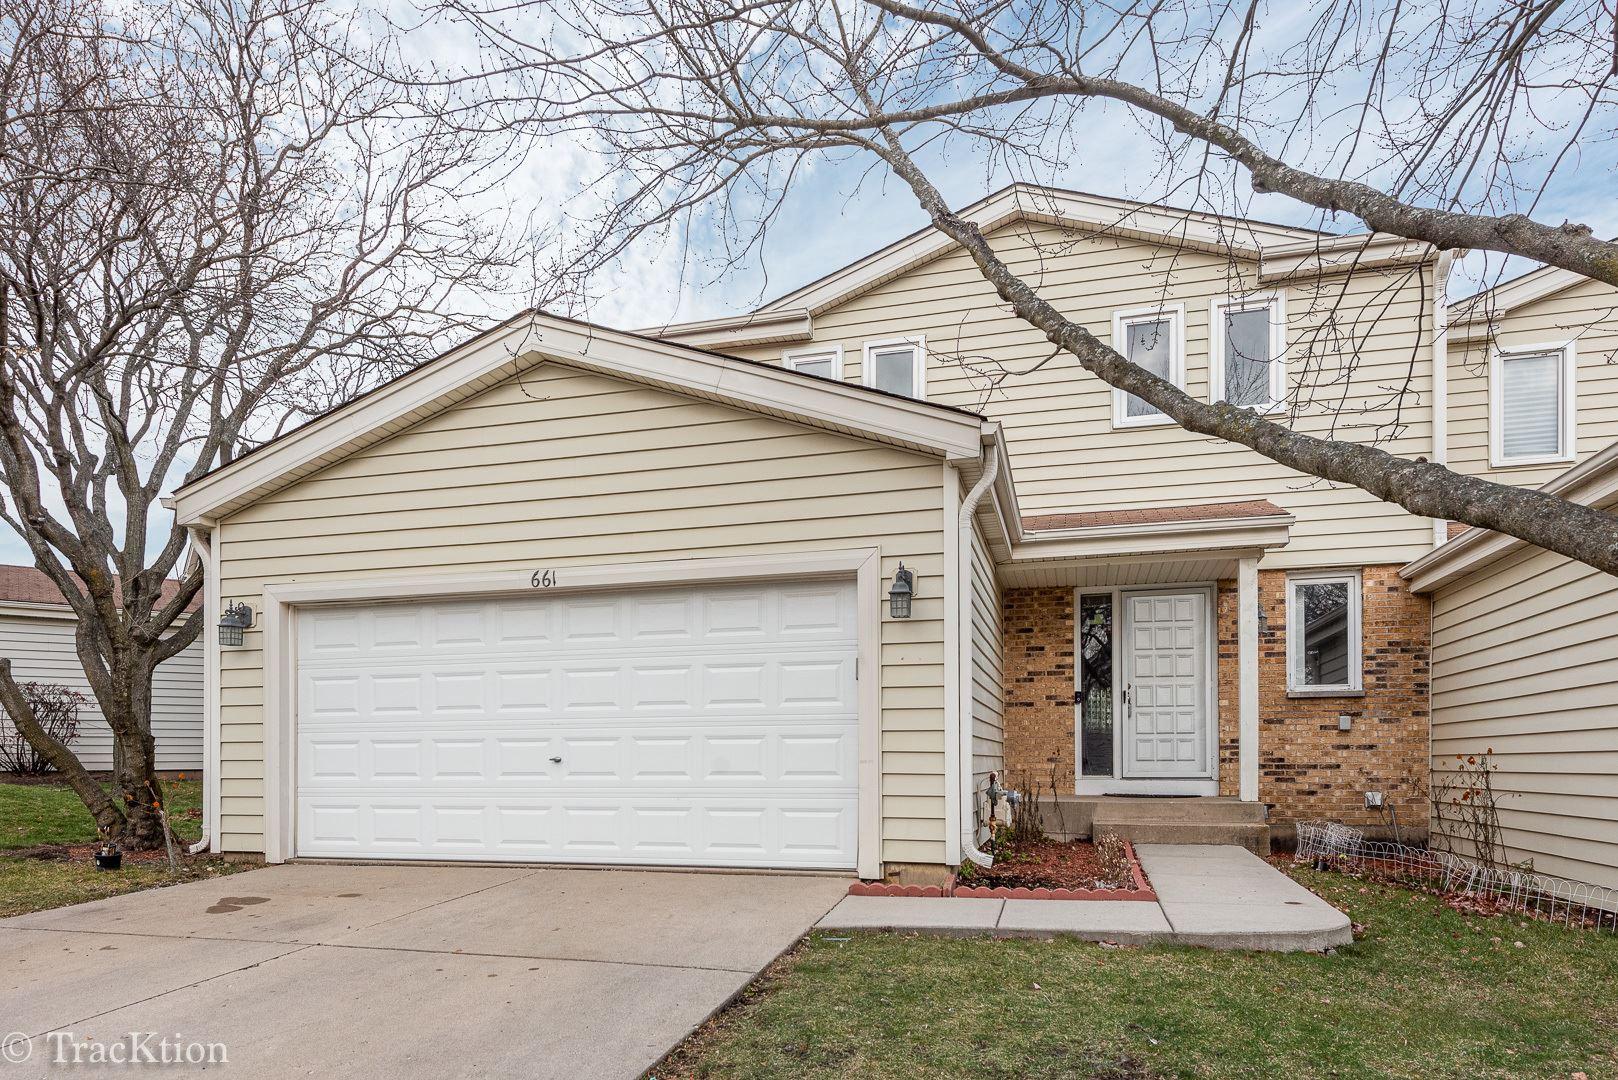 661 Partridge Hill Drive, Hoffman Estates, IL 60169 - #: 10951650